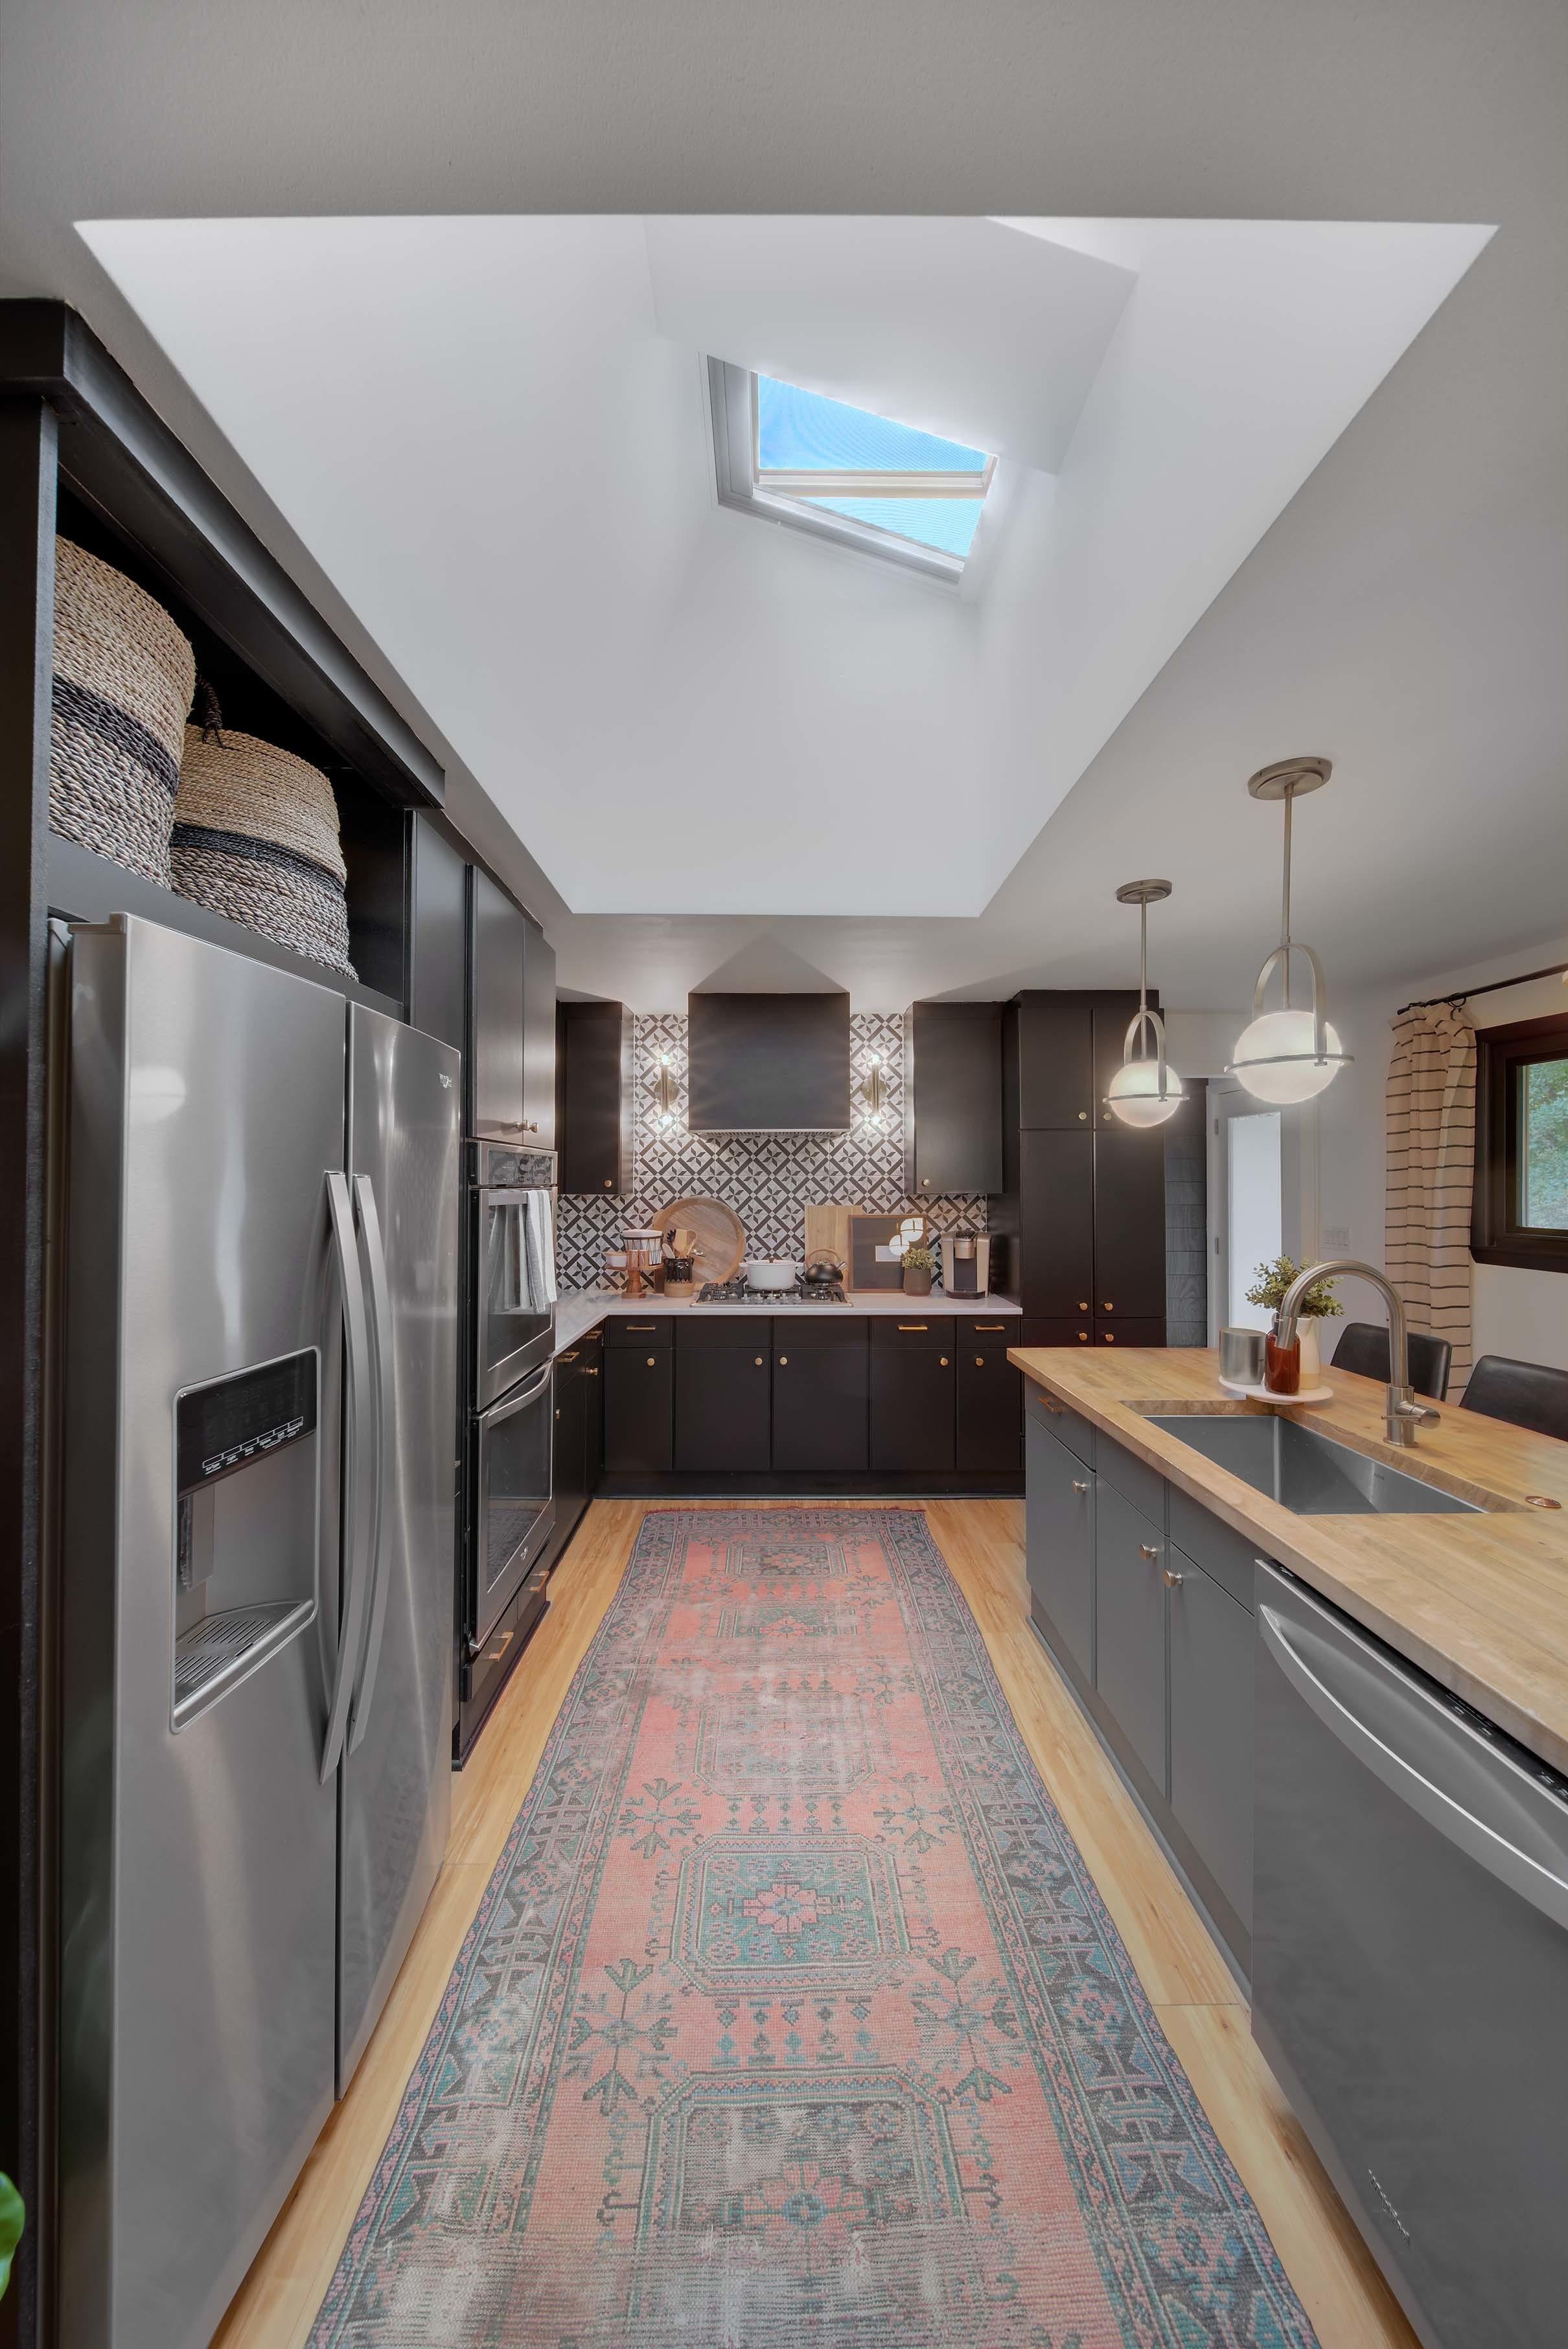 Kitchen open skylights vintage rug butcher block island